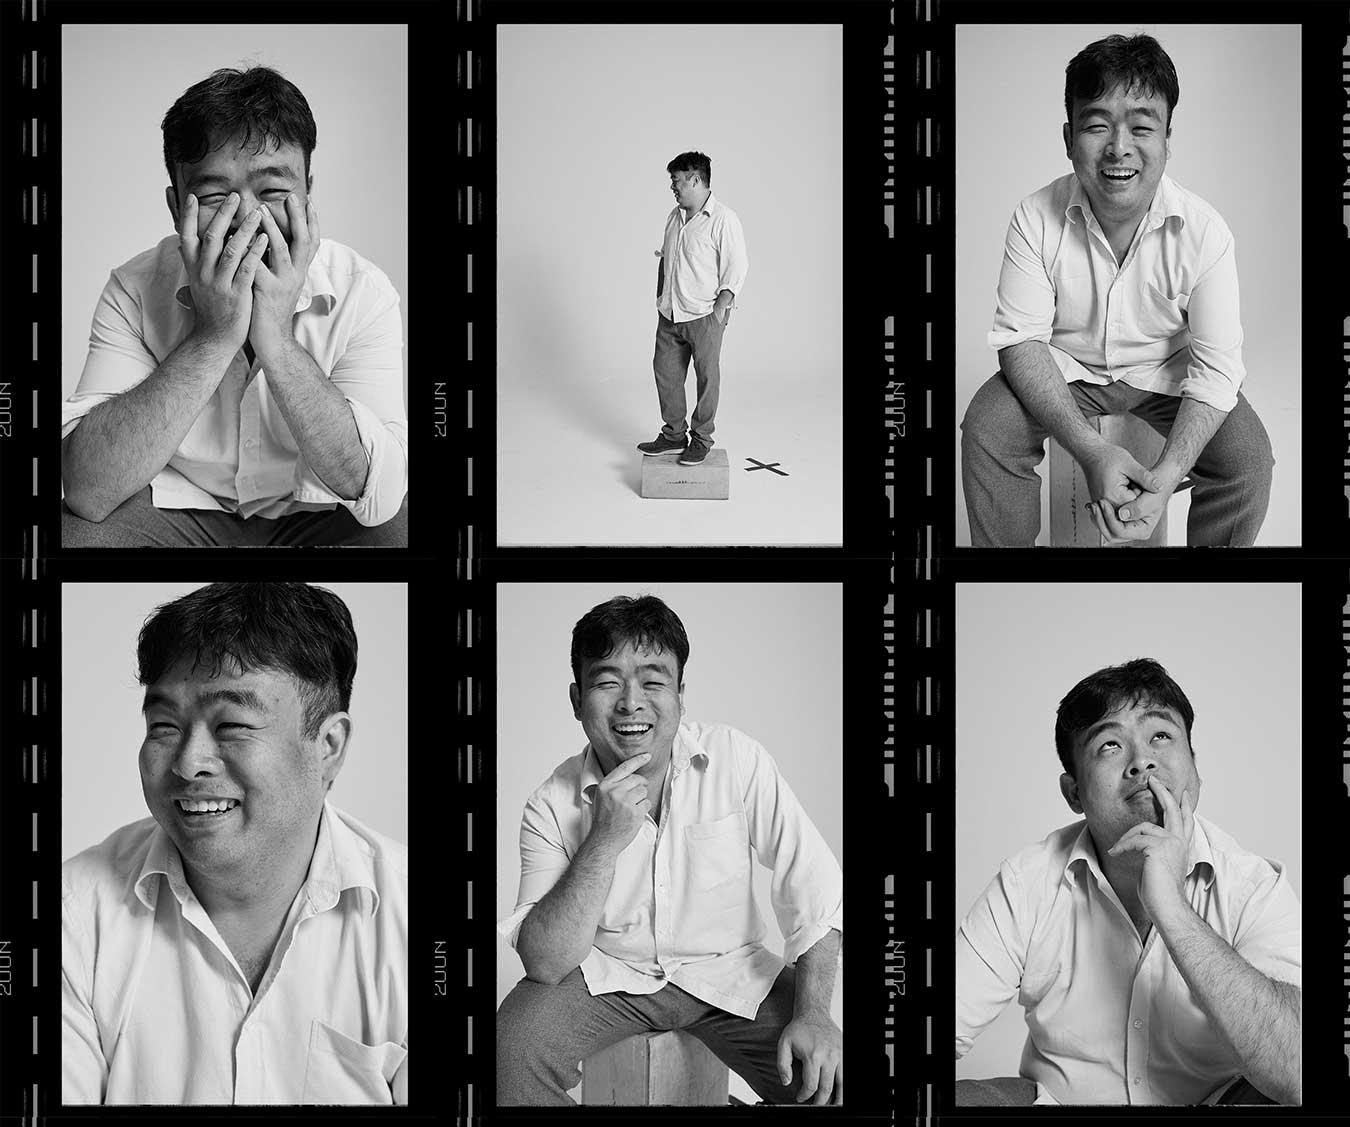 film-reel-style-portrait-set-of-david-tran-laughing-looking-to-camera-andlooking-away